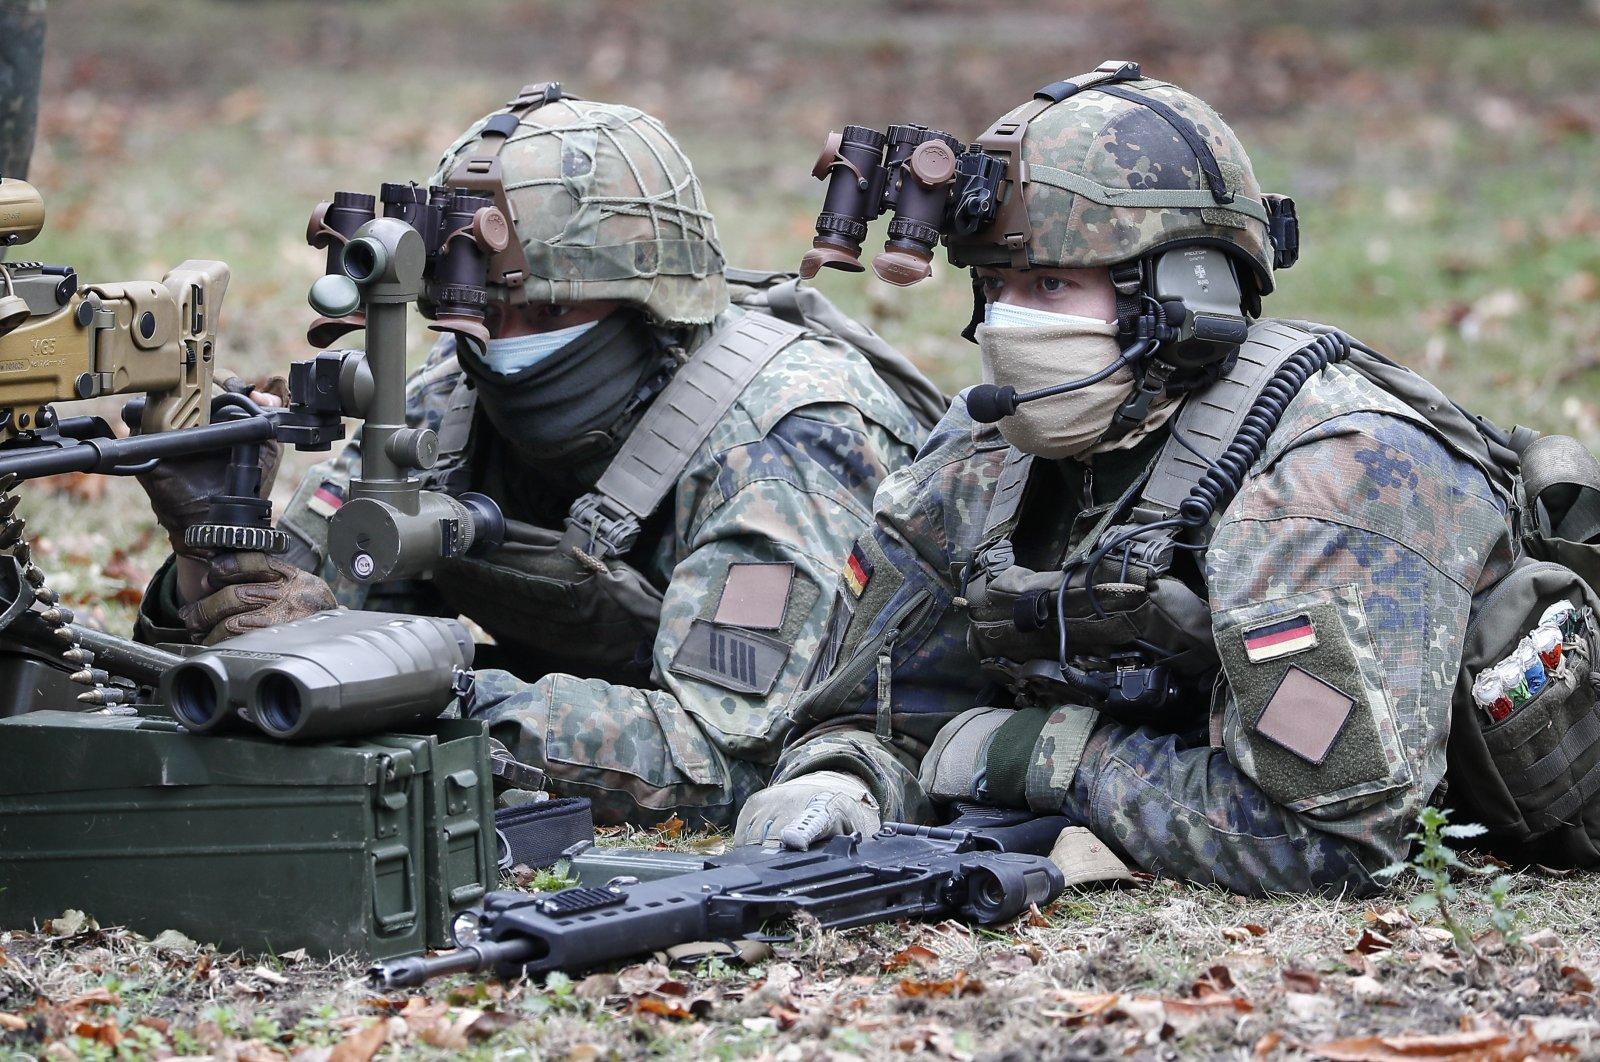 Soldiers demonstrate their skills during the visit of German President Frank-Walter Steinmeier at the German/Netherlands Corps in Muenster, Germany, Sept. 29, 2020. (AP Photo)